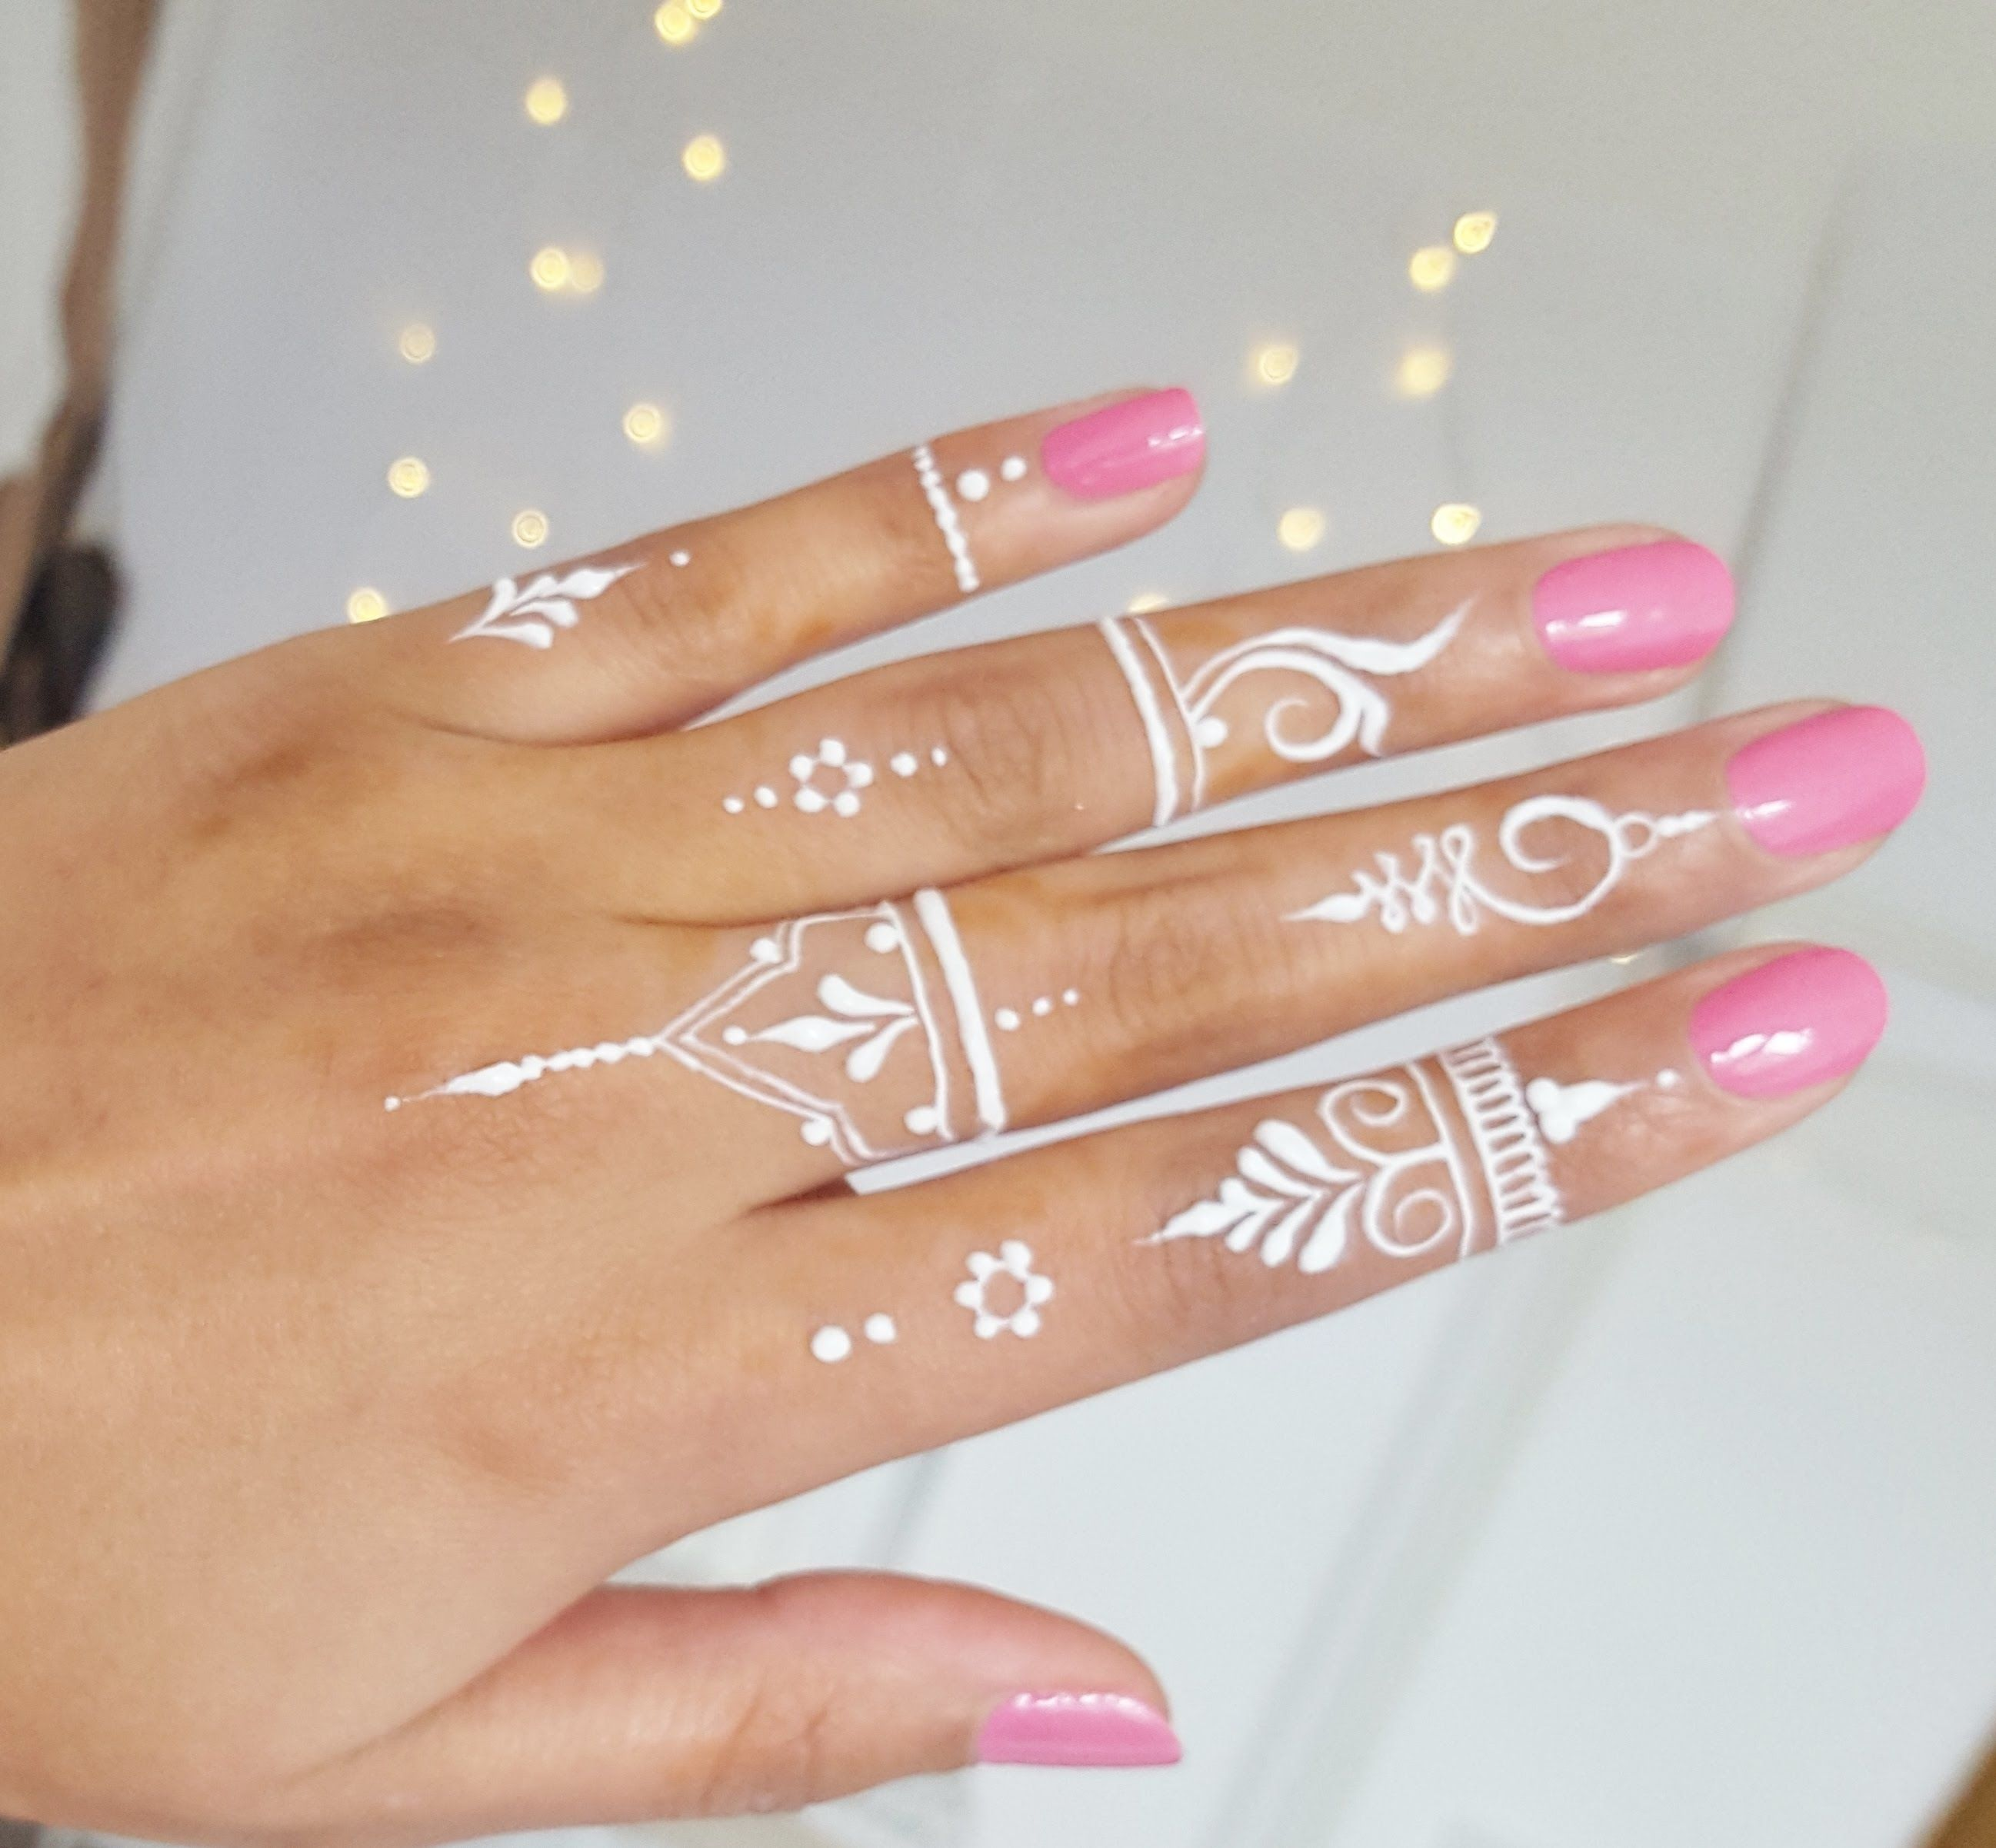 Henna Tattoo Ring Designs: How To: White Henna Tutorial